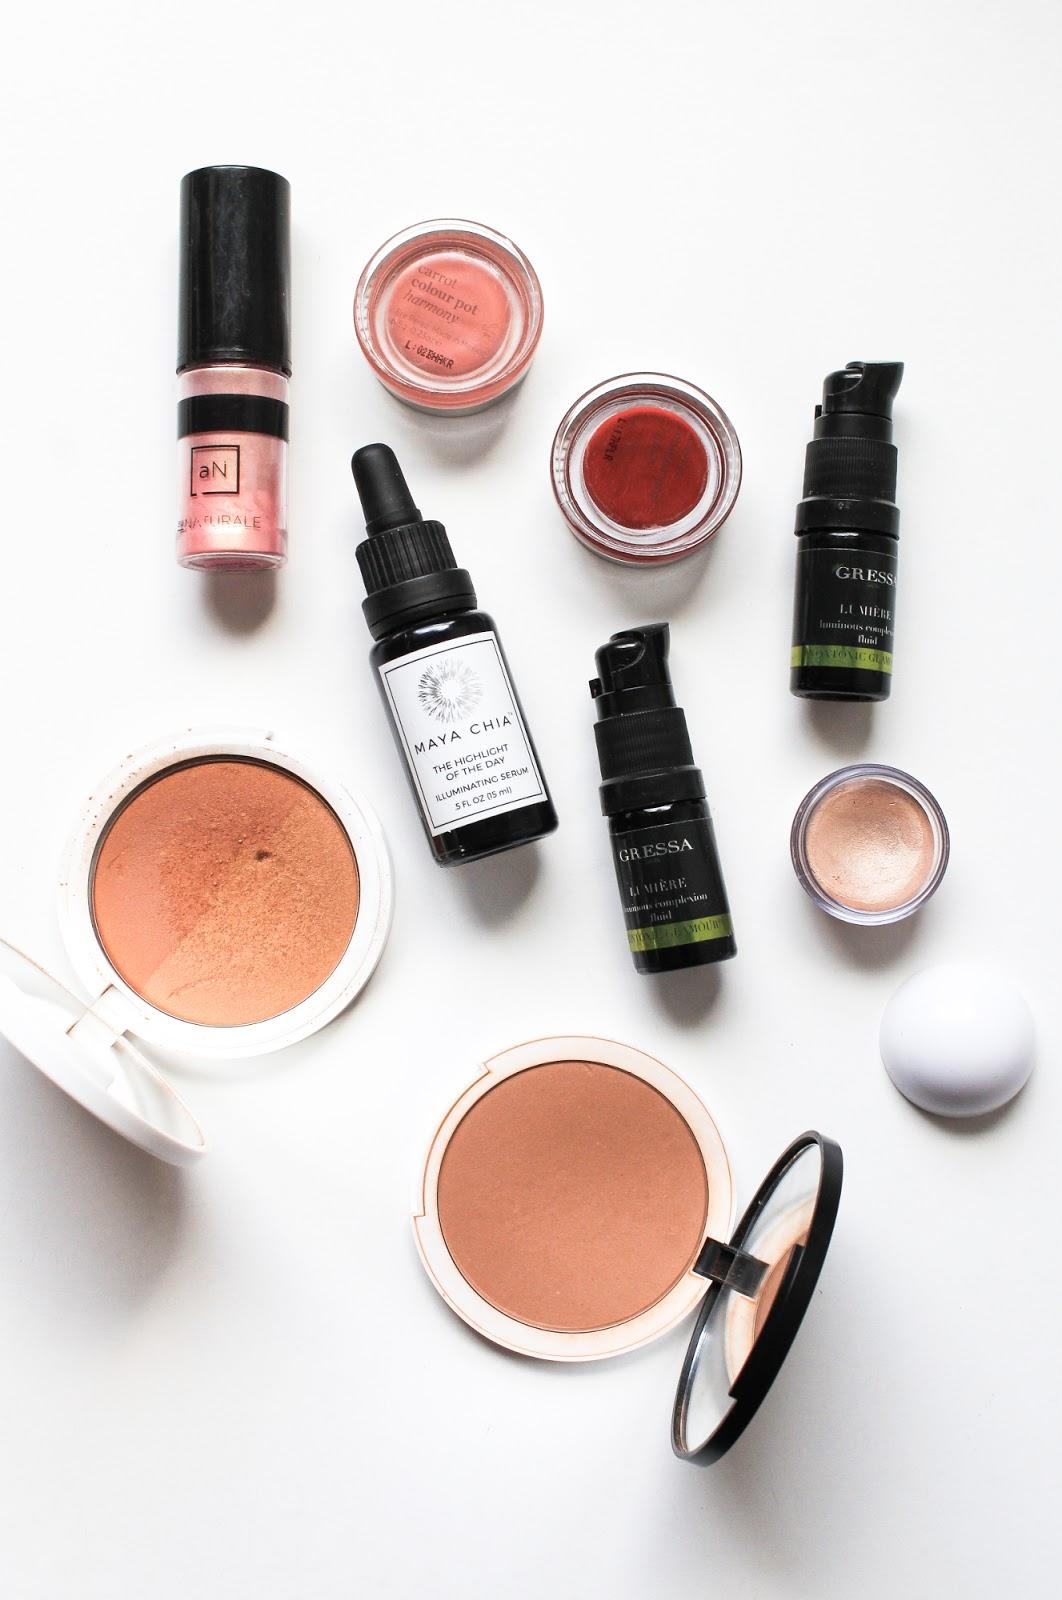 Natural Organic Makeup Bronzer, Blush, Highlighter, Au Naturale, Ere Perez, Maya Chia, Gressa, Lily Lolo, Modern Minerals